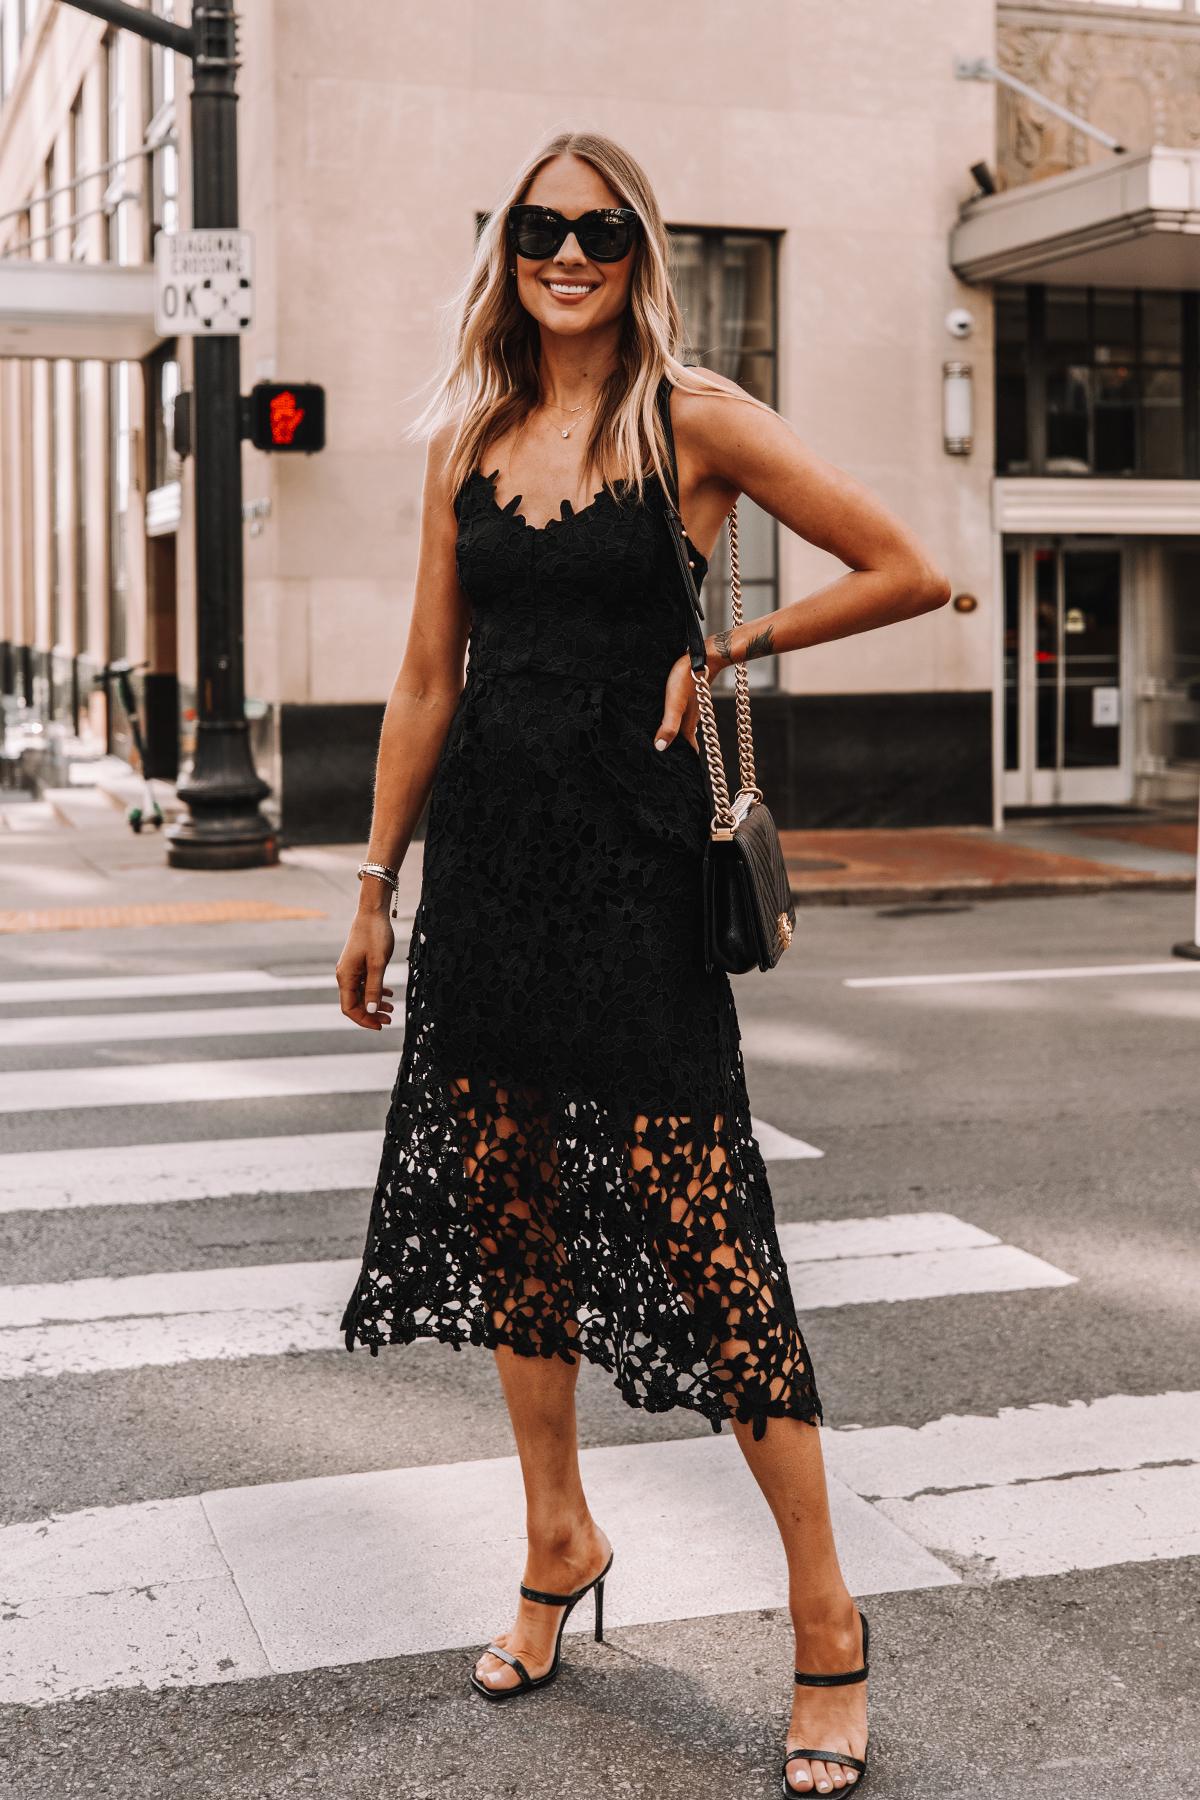 Fashion Jackson Wearing Black Lace Midi Dress Black Heeled Sandals Cocktail Dress 4